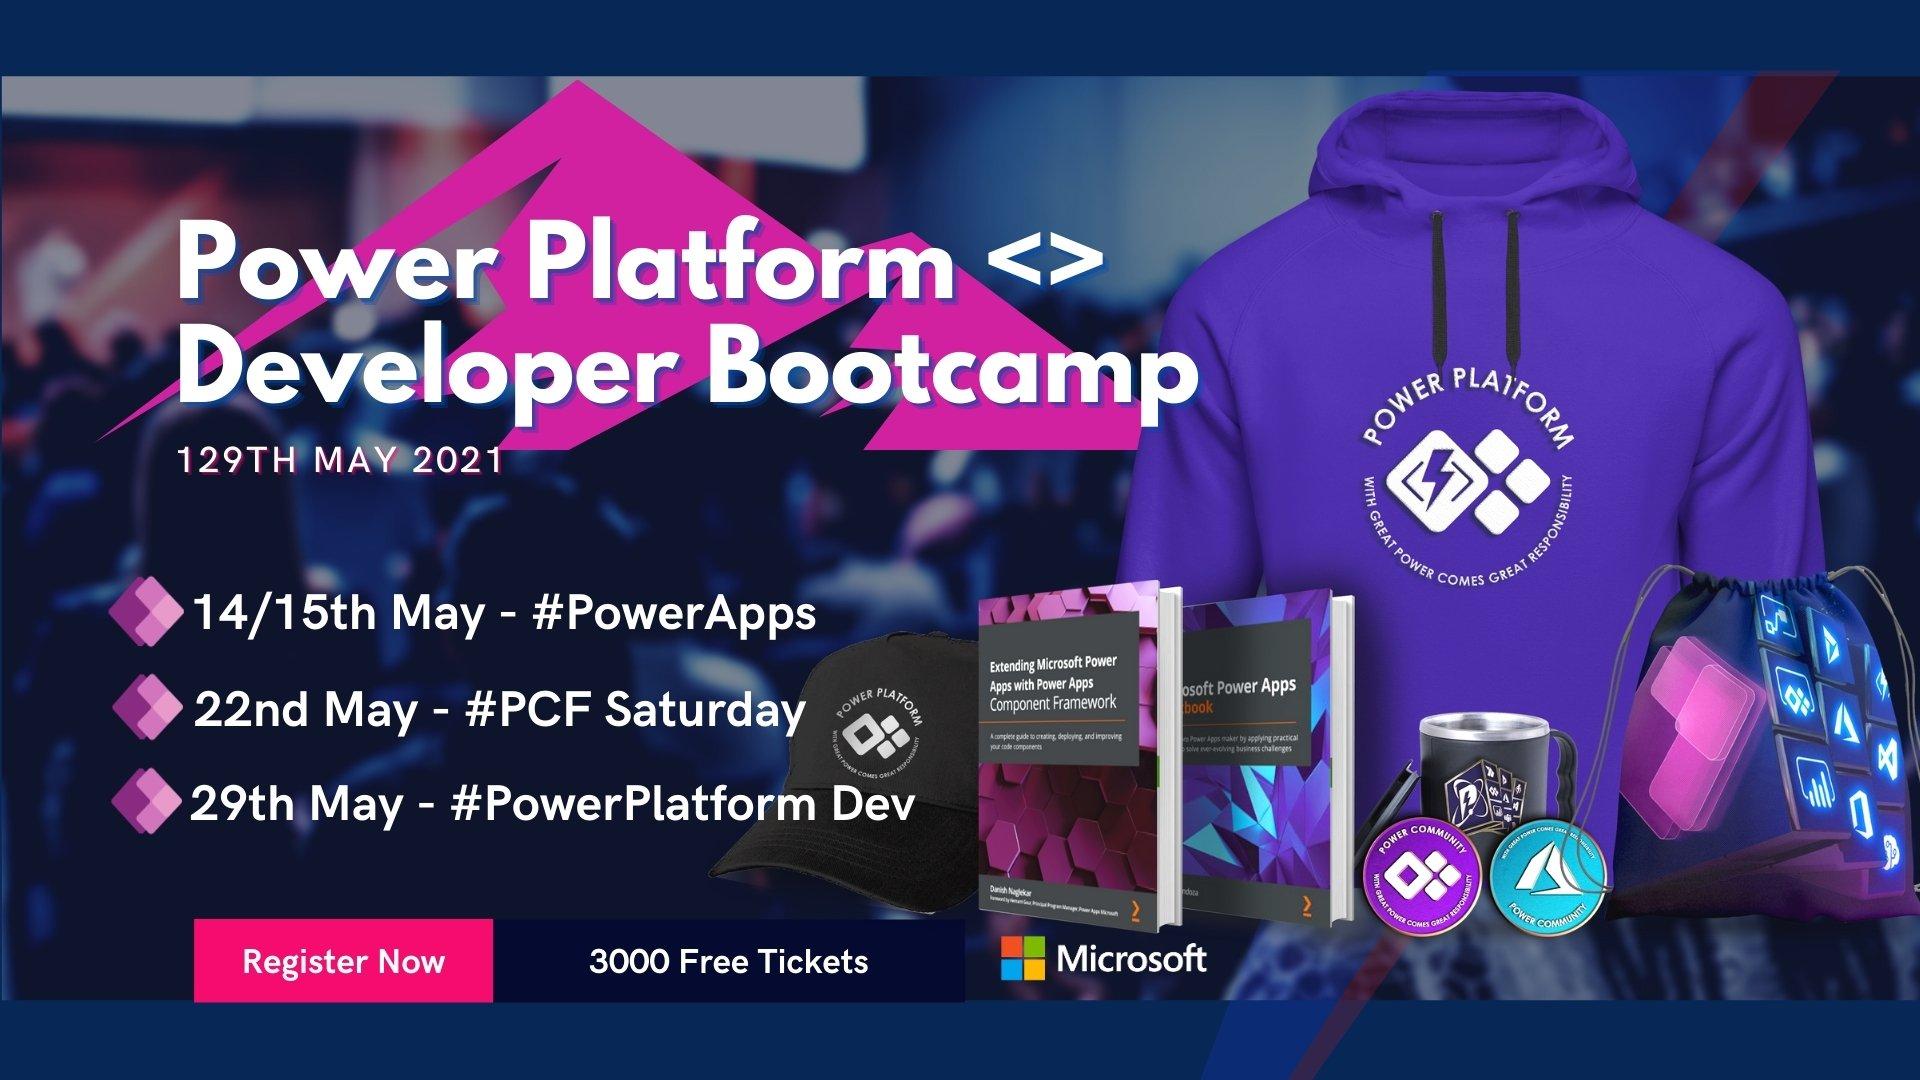 Power Platform Developer Bootcamp 2021